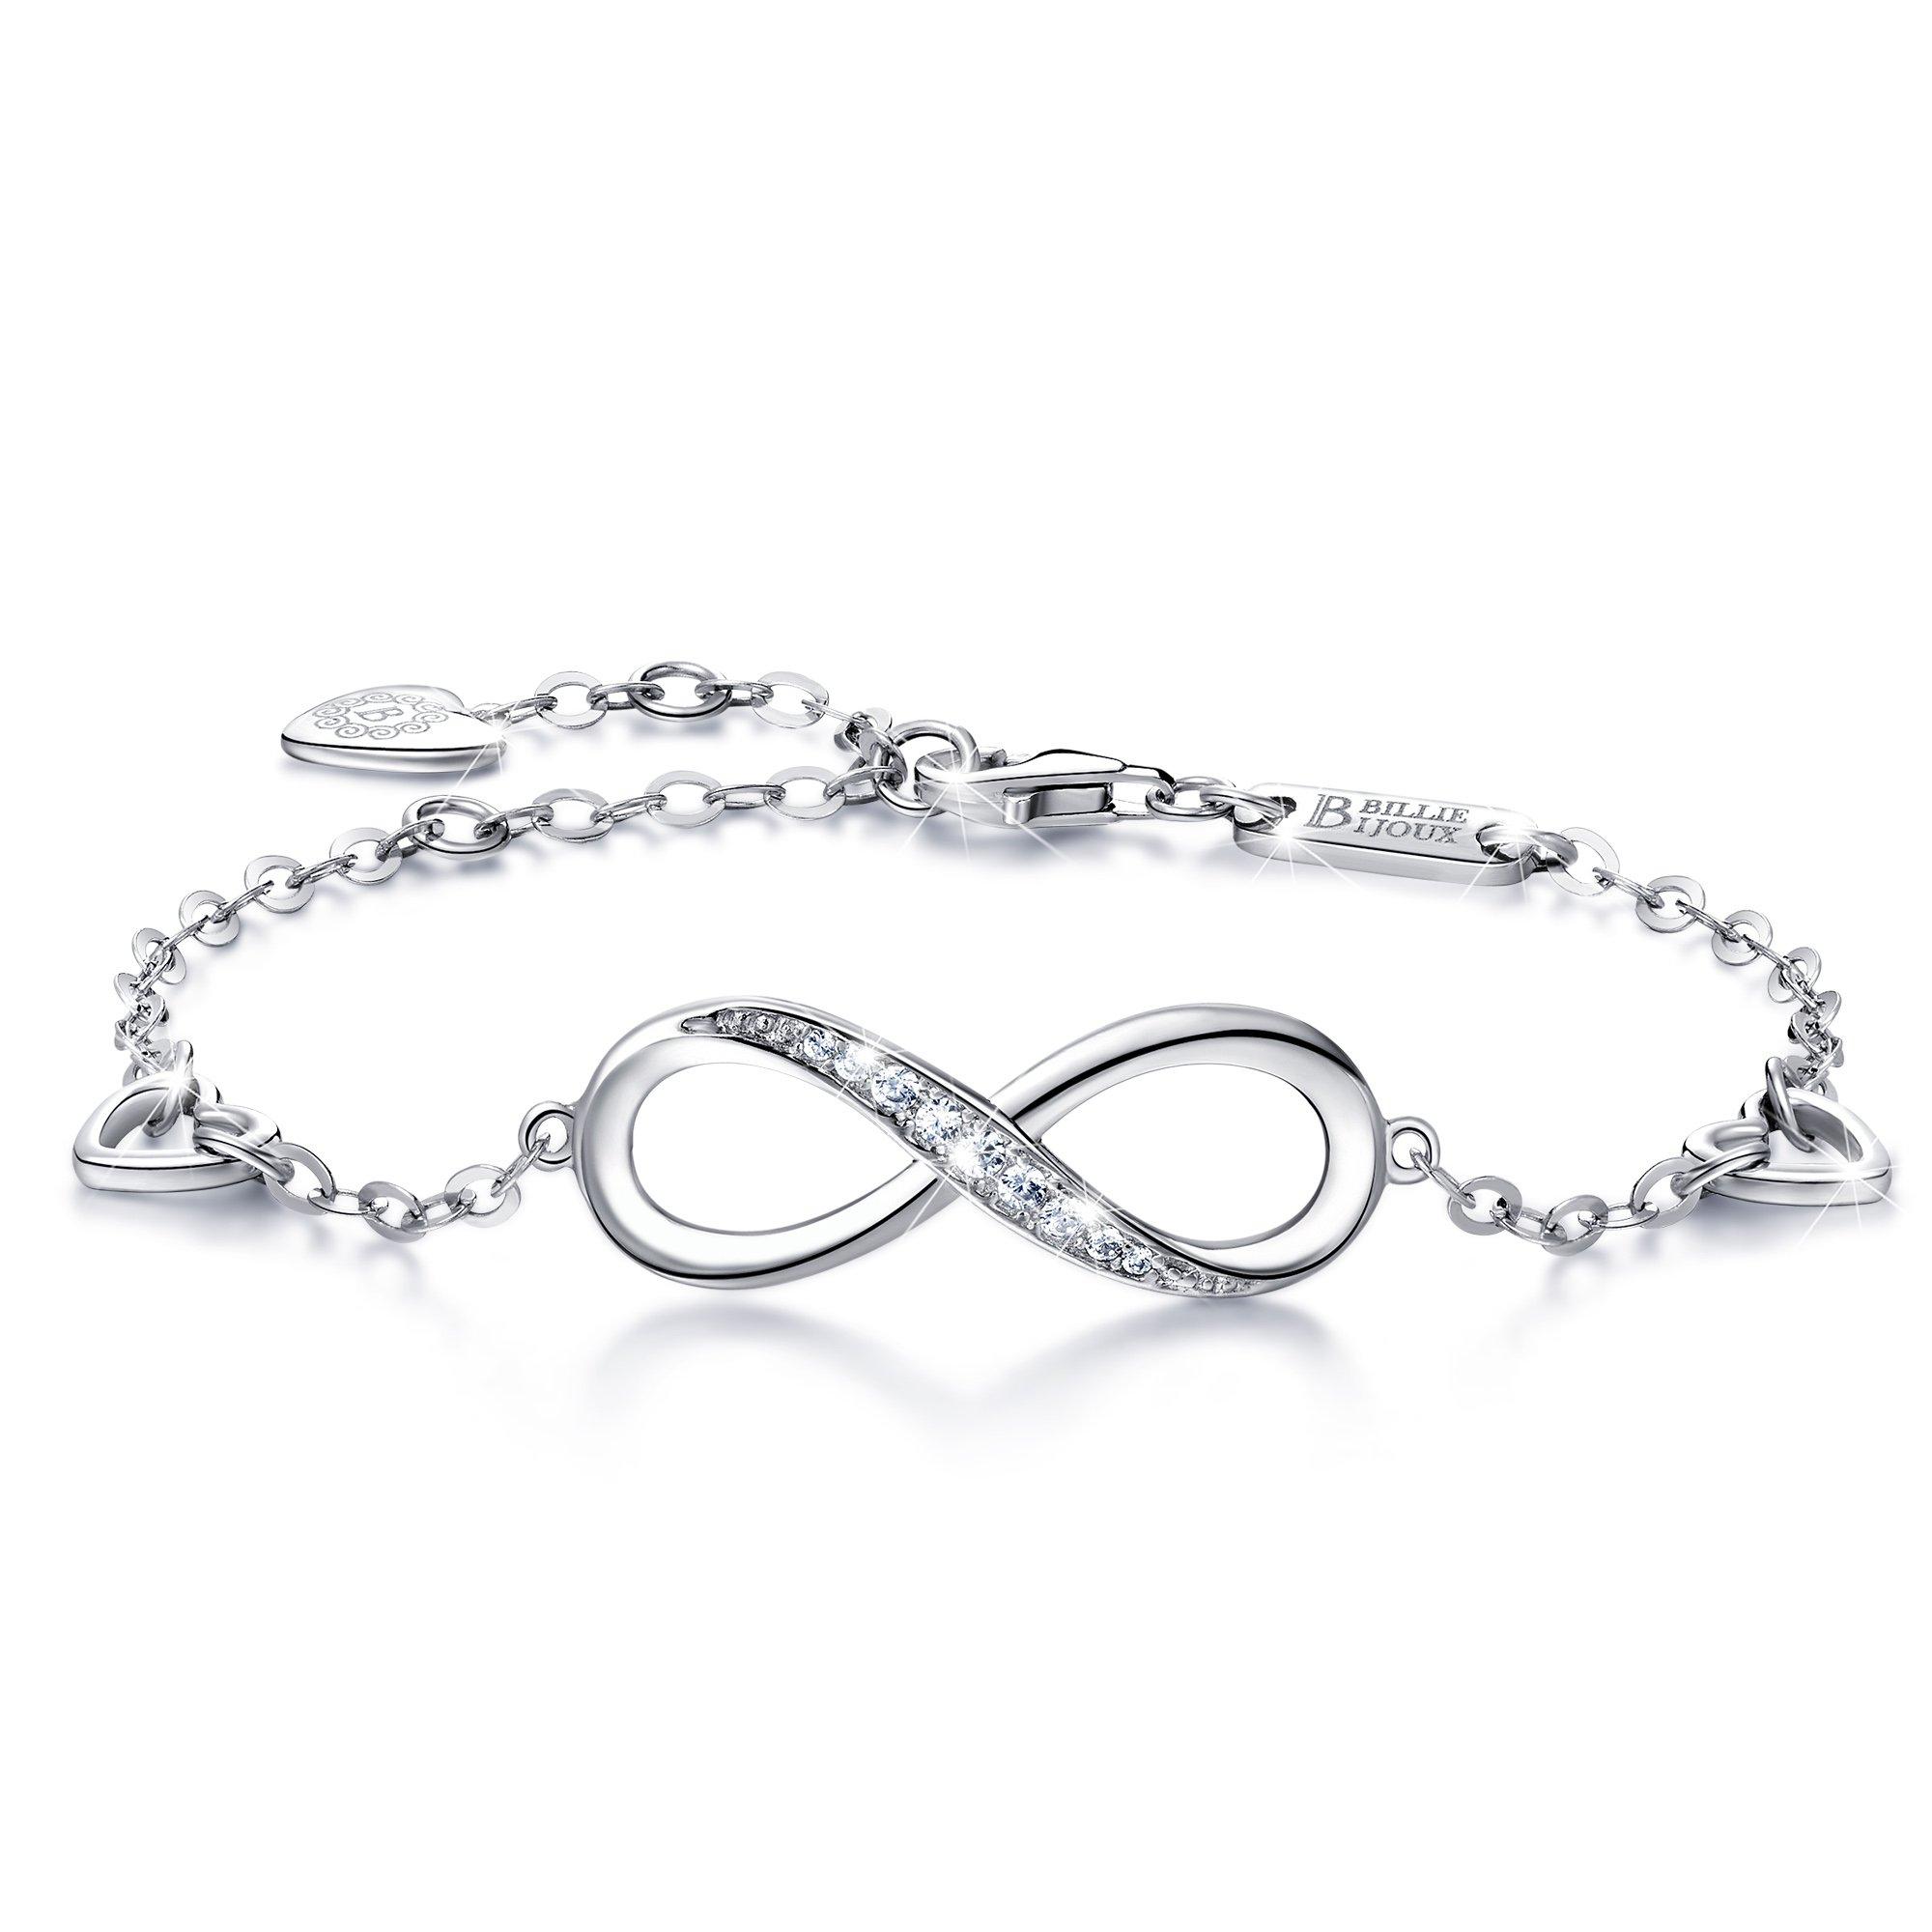 Billie Bijoux Womens 925 Sterling Silver Infinity Endless Love Symbol Charm Adjustable Bracelet Gift for Women Girls (A- Silver) by Billie Bijoux